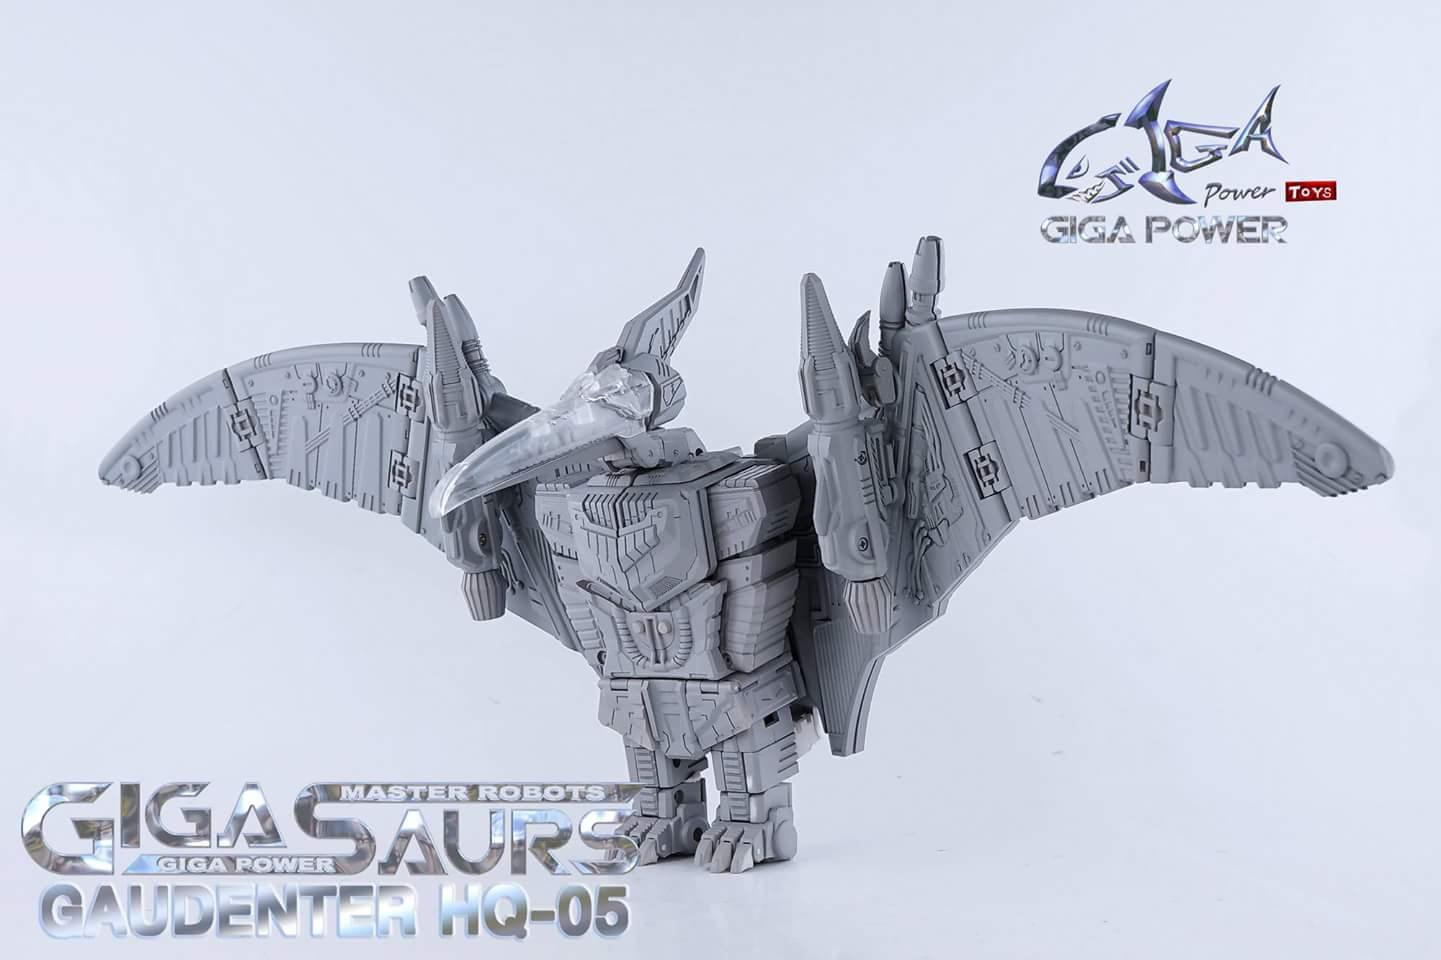 [GigaPower] Produit Tiers - Jouets HQ-01 Superator + HQ-02 Grassor + HQ-03 Guttur + HQ-04 Graviter + HQ-05 Gaudenter - aka Dinobots - Page 4 Kqg8yMh2